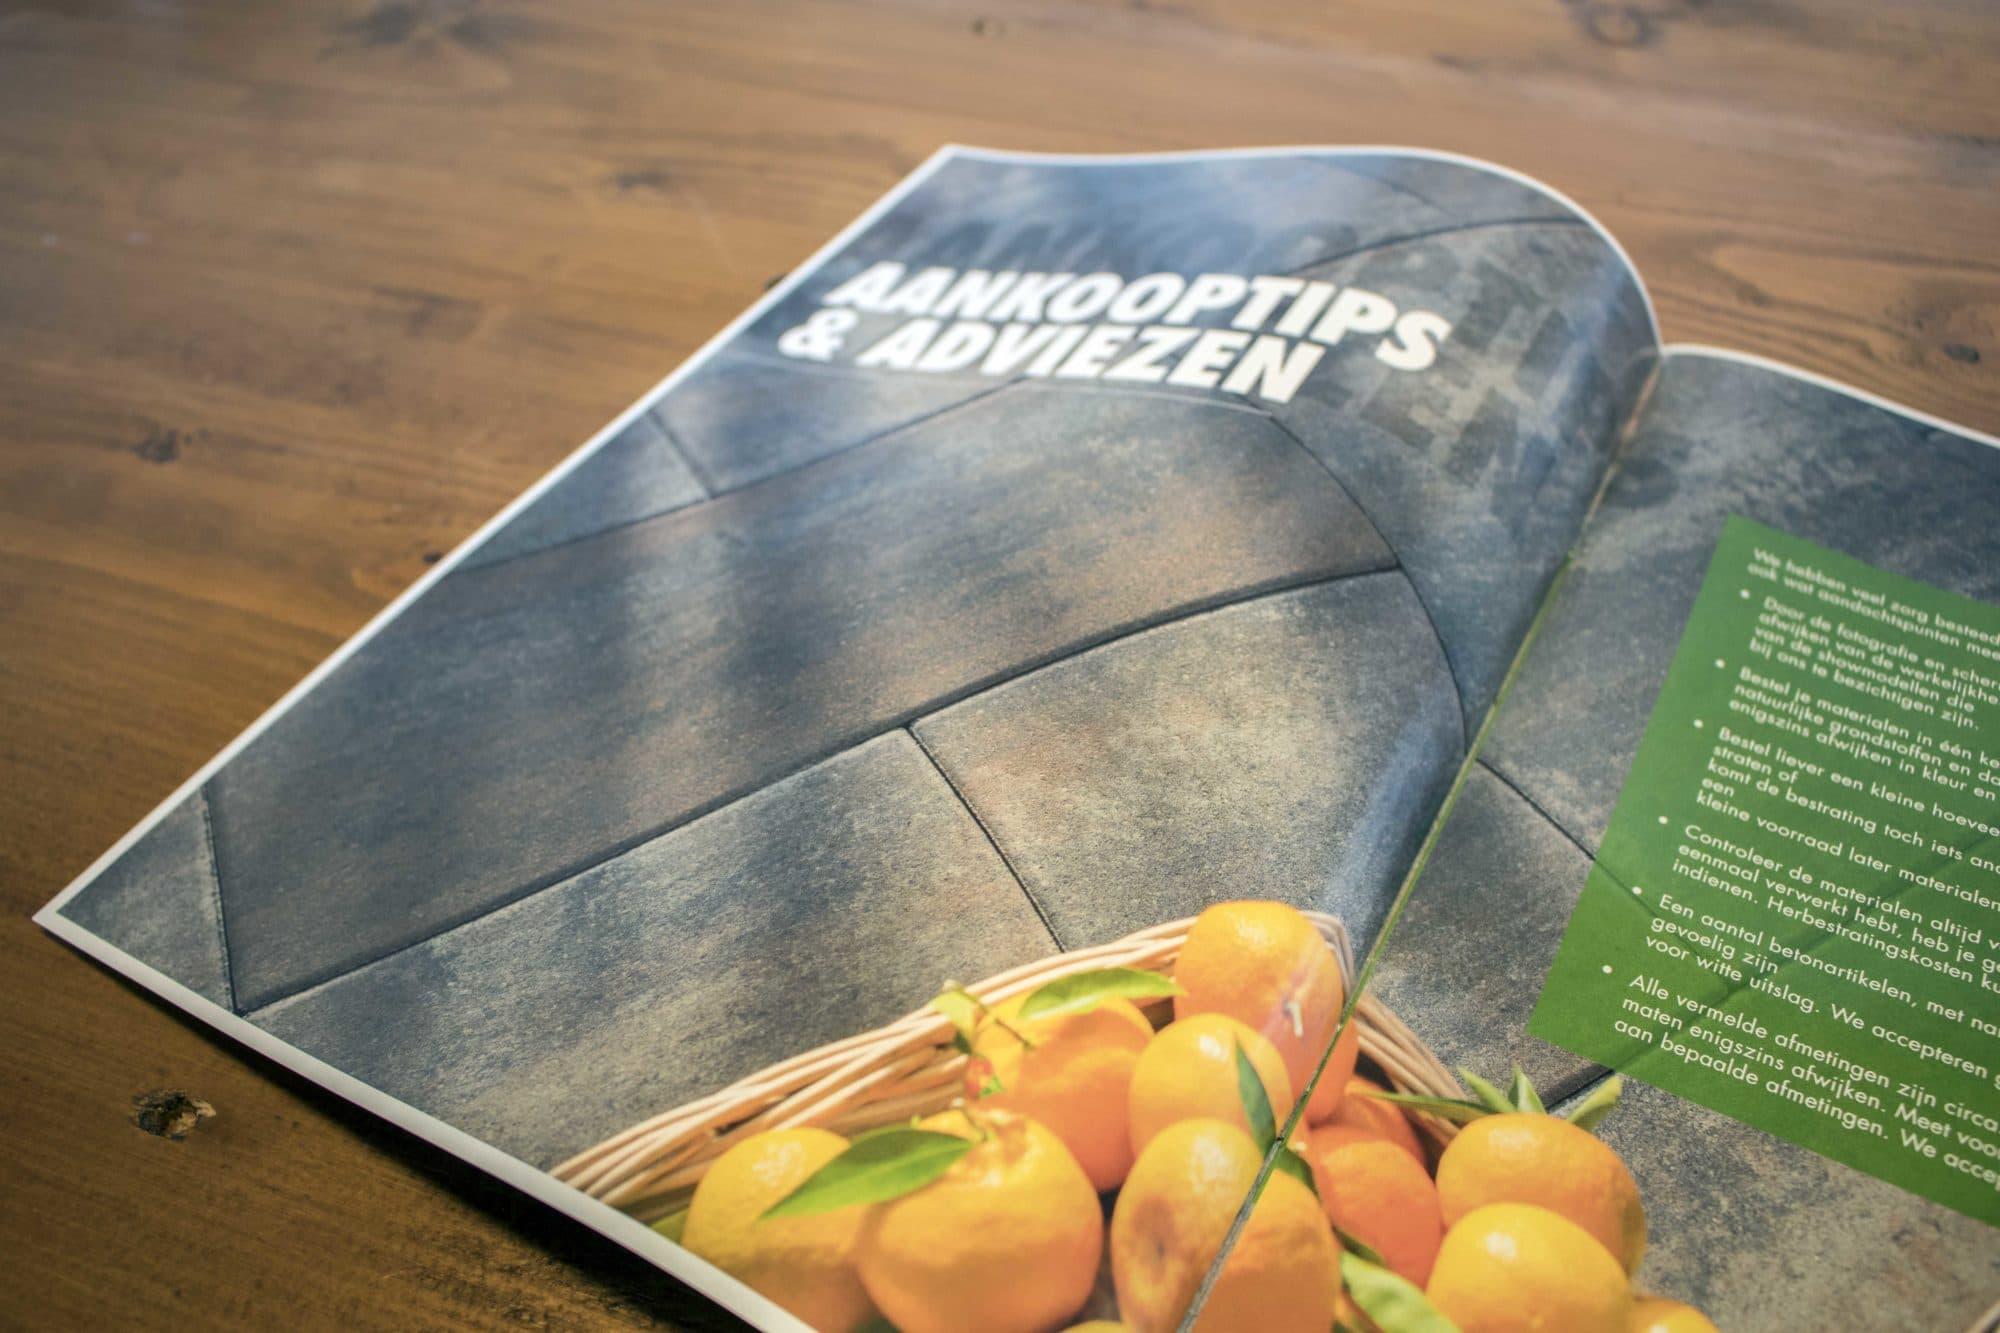 promotiematerialen - Tuinbeurs Nederland